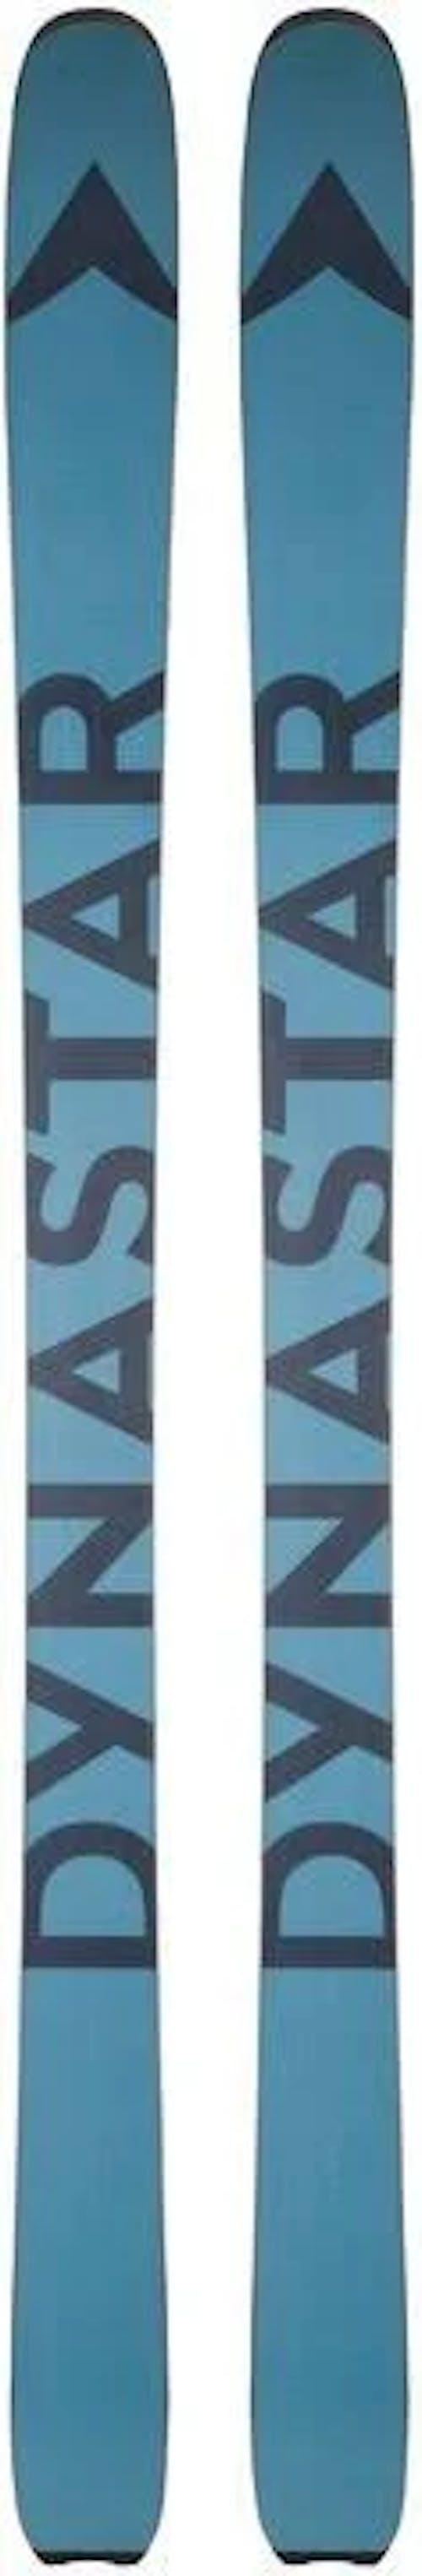 Dynastar M-pro 90 Skis · 2021